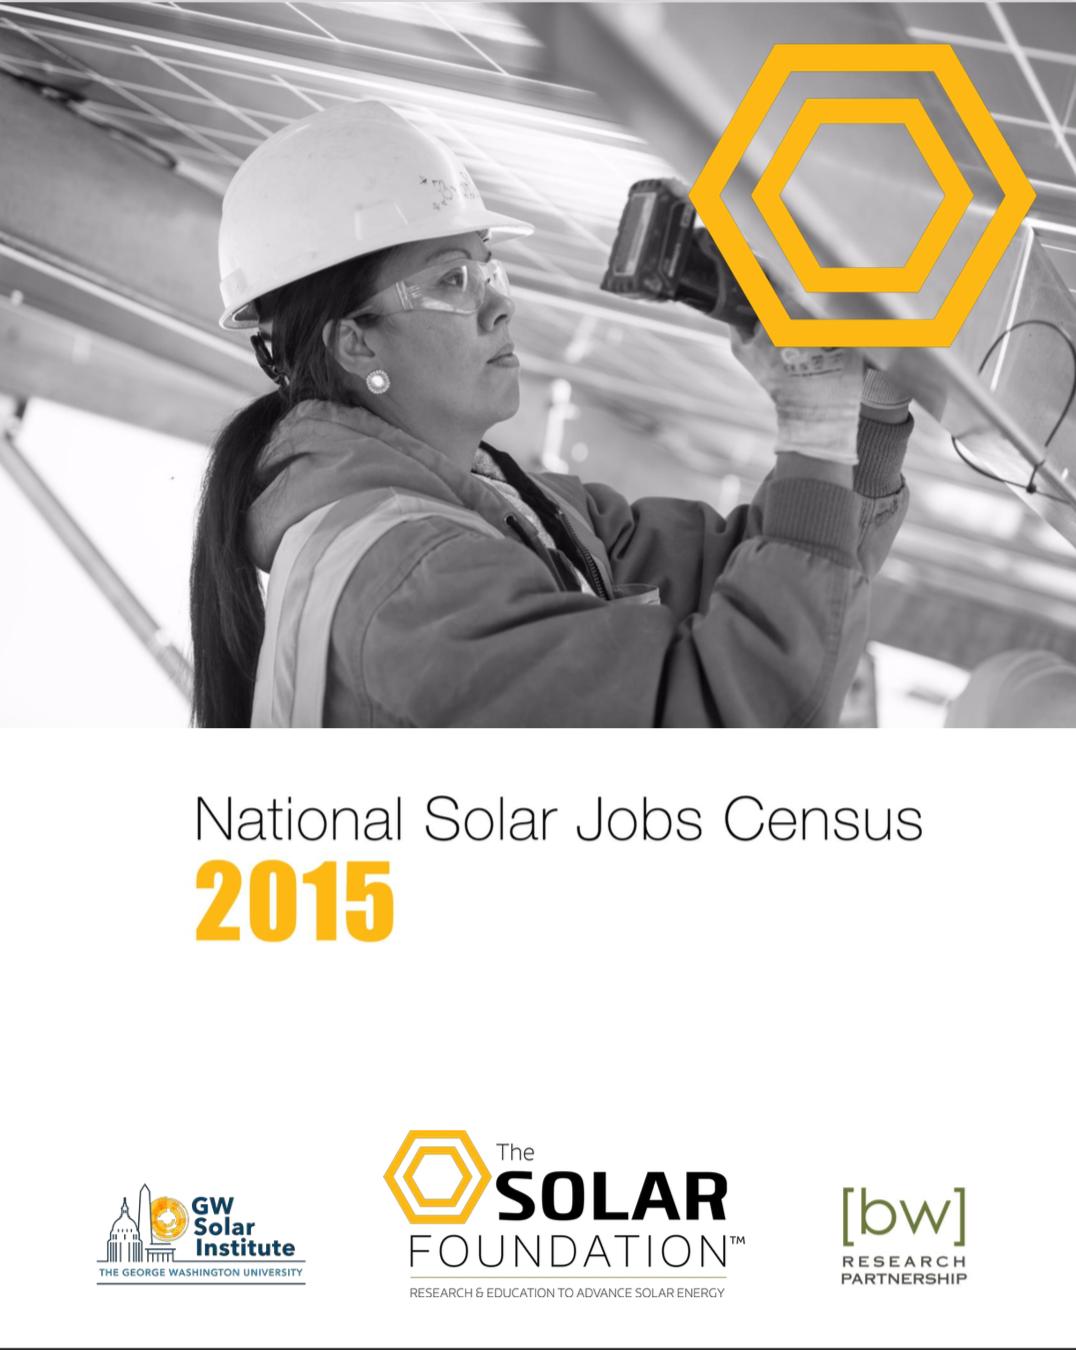 National Solar Jobs Census 2015